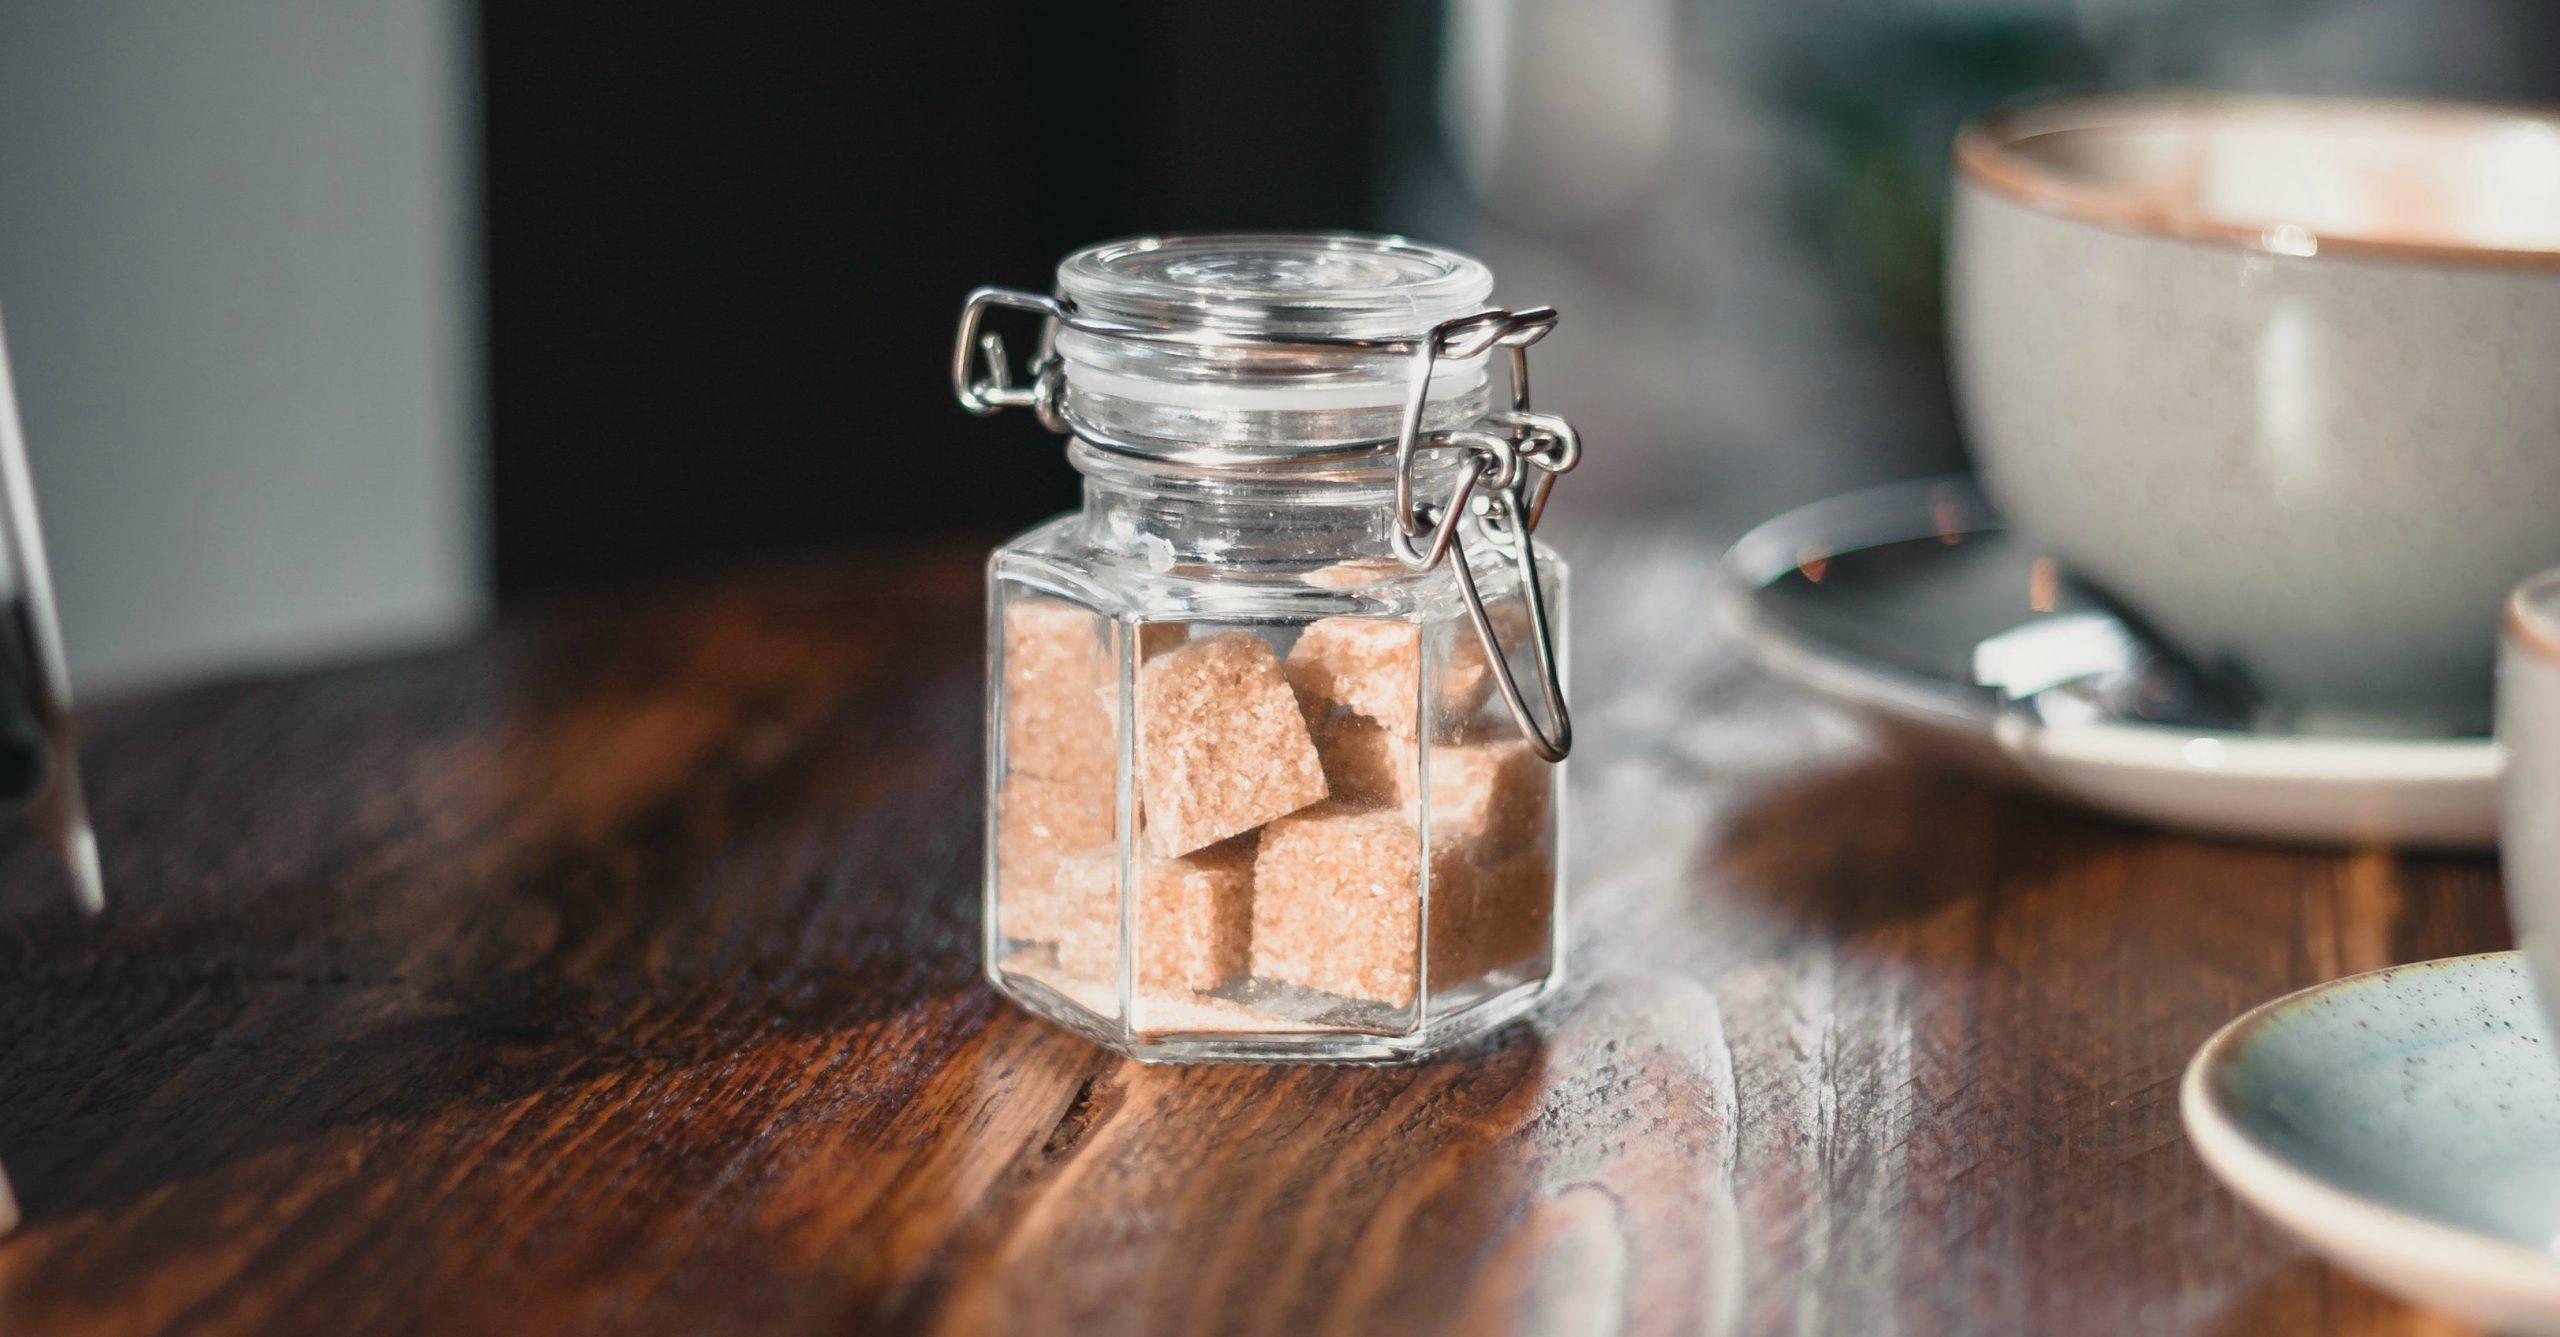 Guter Zucker oder schlechter Zucker?